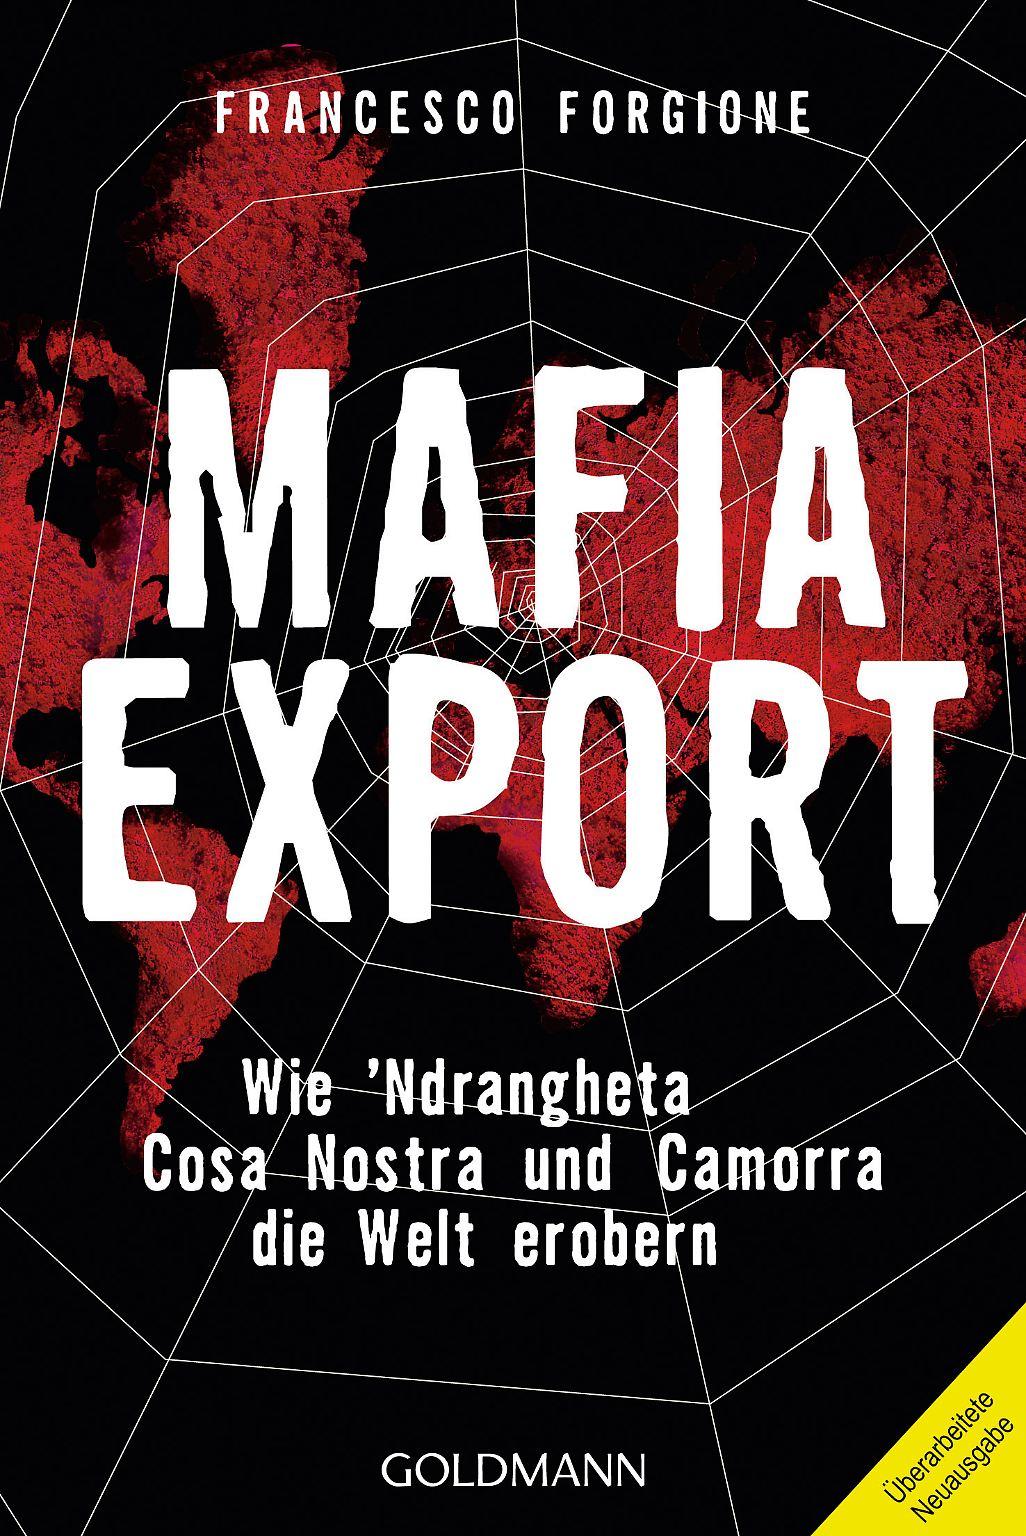 Forgione_FMafia-Export__117619_300dpi.jpg